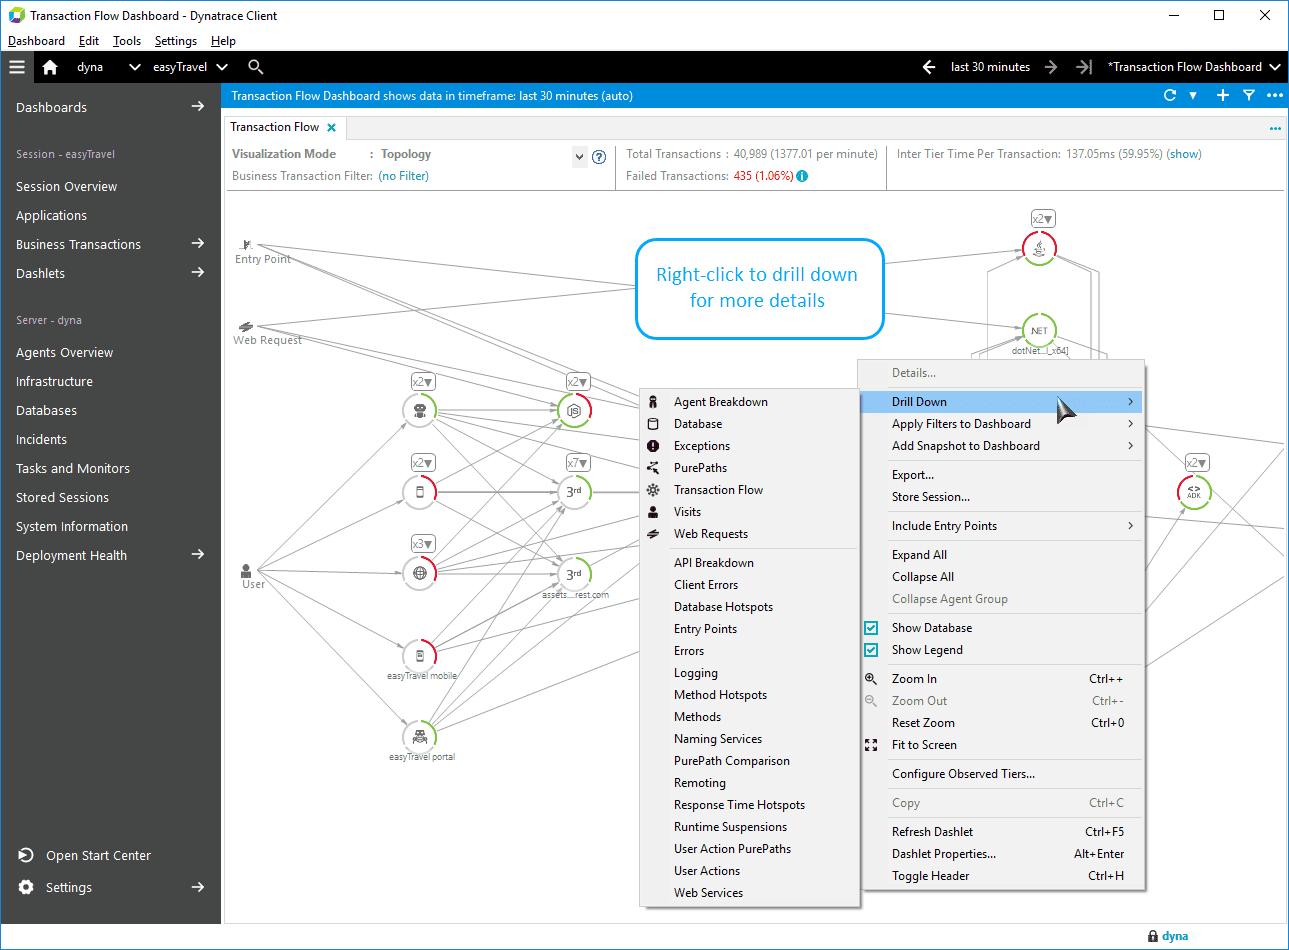 Right-click to open the context menu